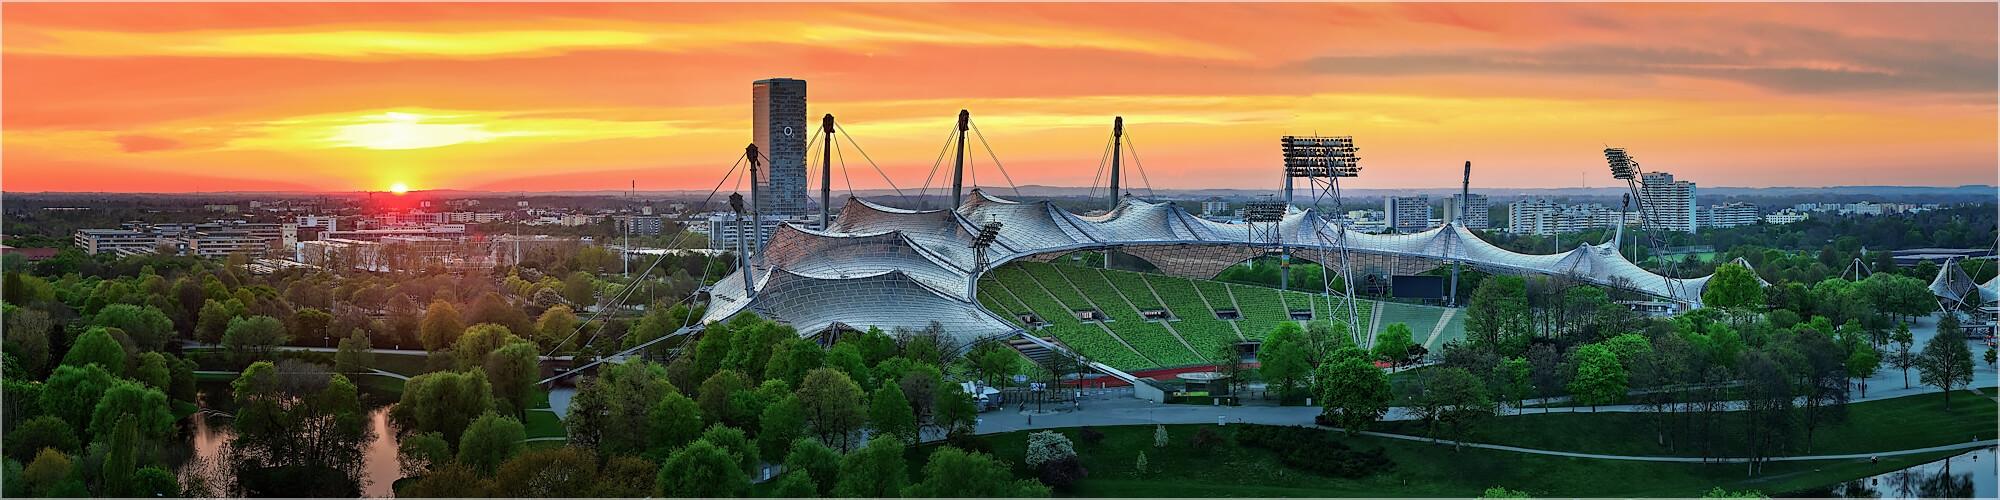 Panoramabild München Olympistadion im Sonnenuntergang